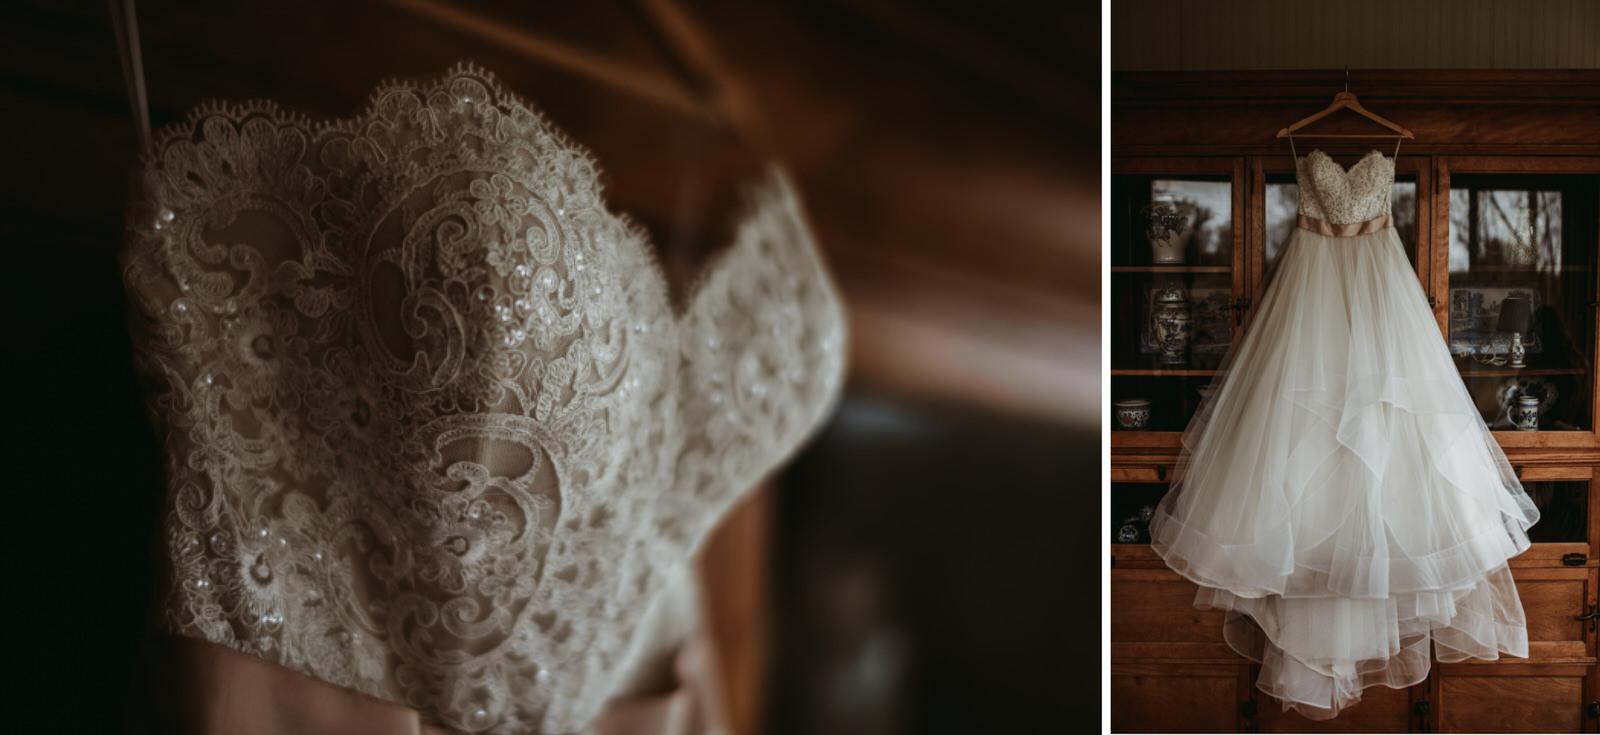 BHLDN wedding dress moody photography, Chicago wedding photography - The Adamkovi